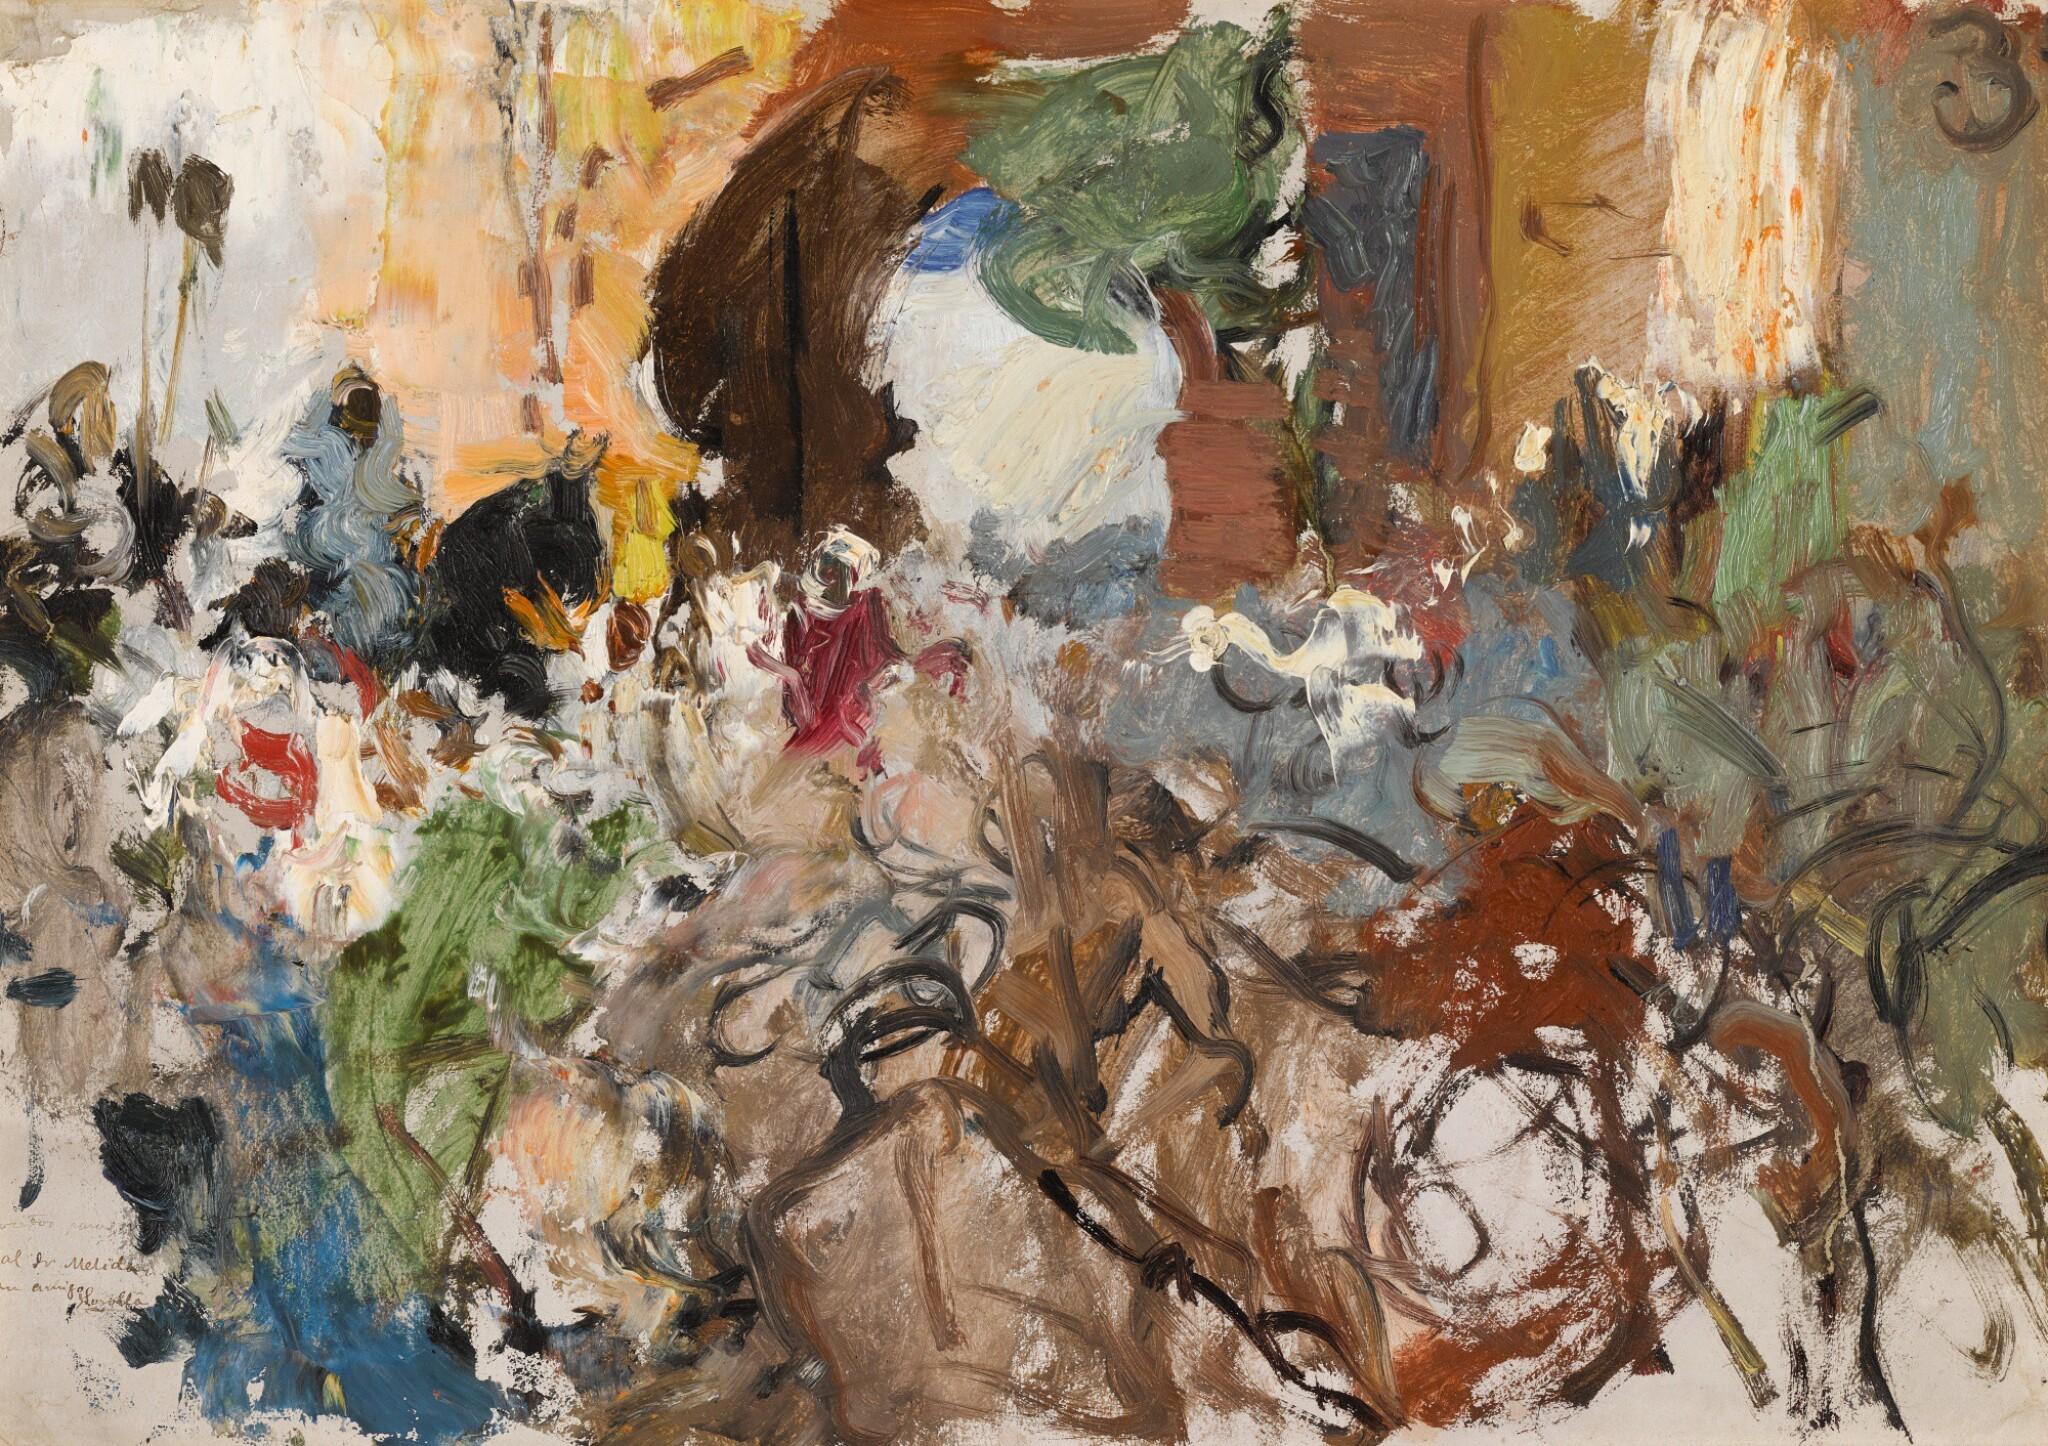 JOAQUÍN SOROLLA | Estudio para Moro a caballo. La sorpresa de Zahara (study for Moorish Rider)